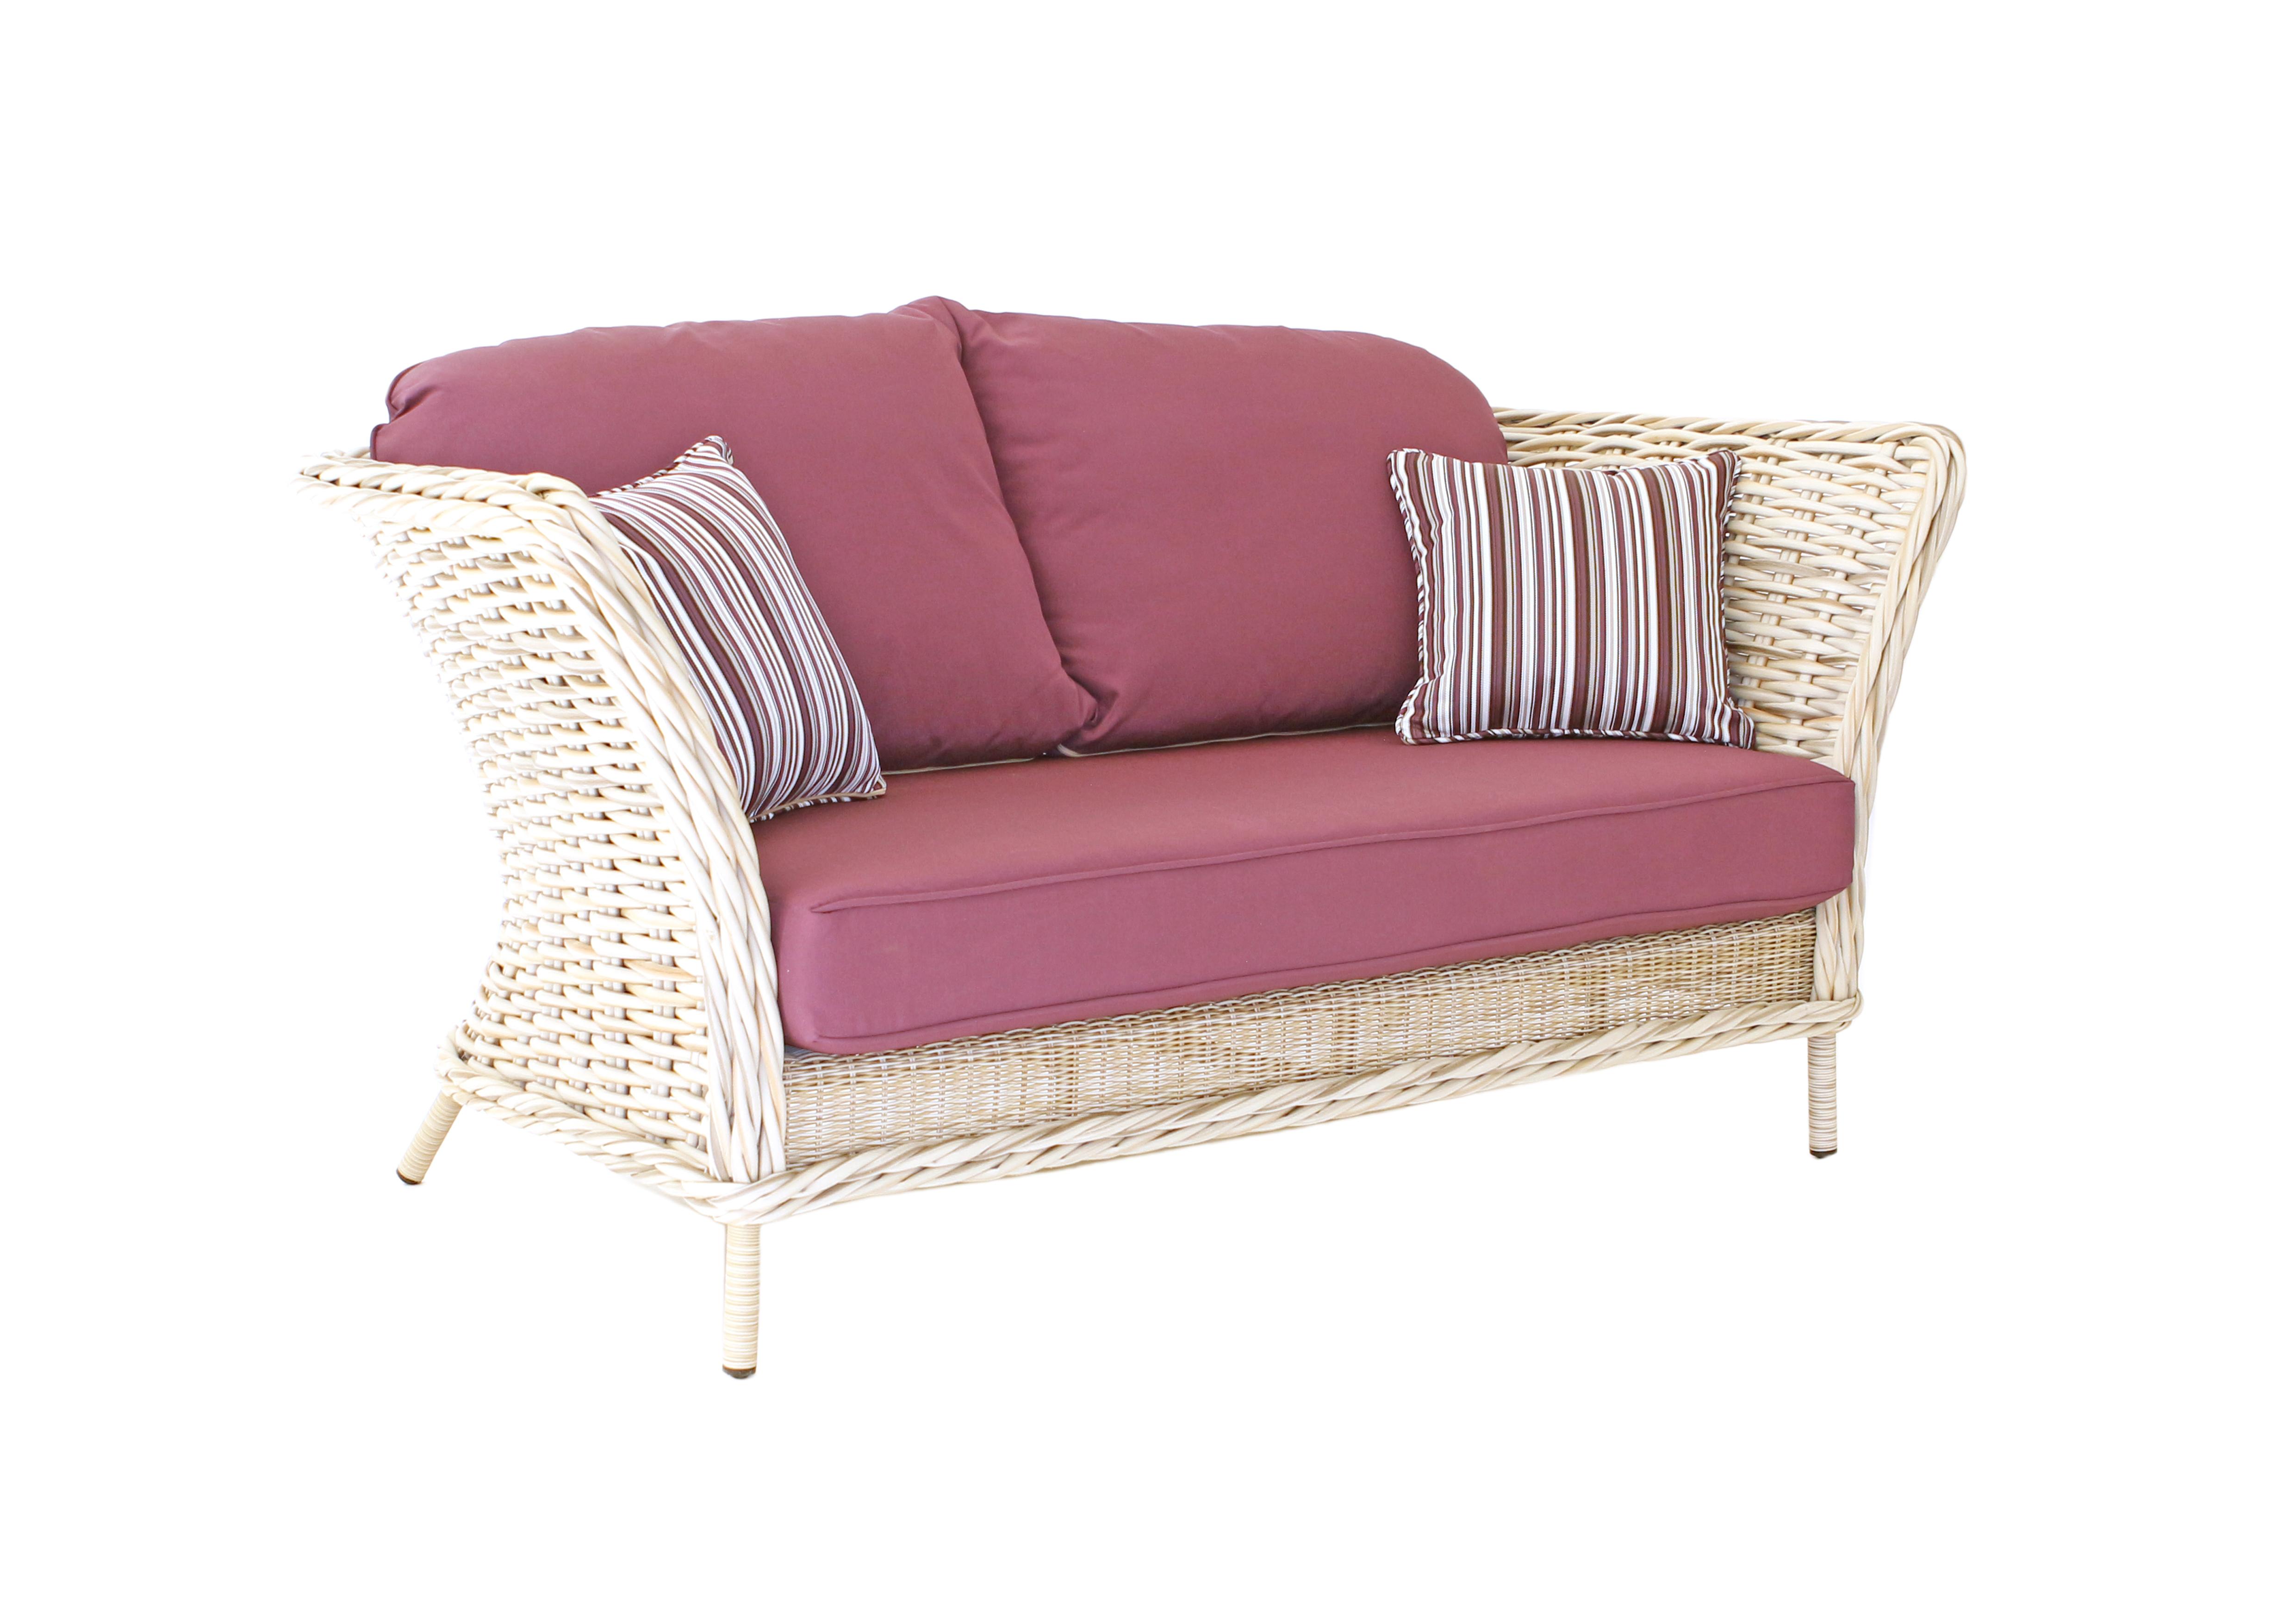 Barcelone lounging sofa angle swindon